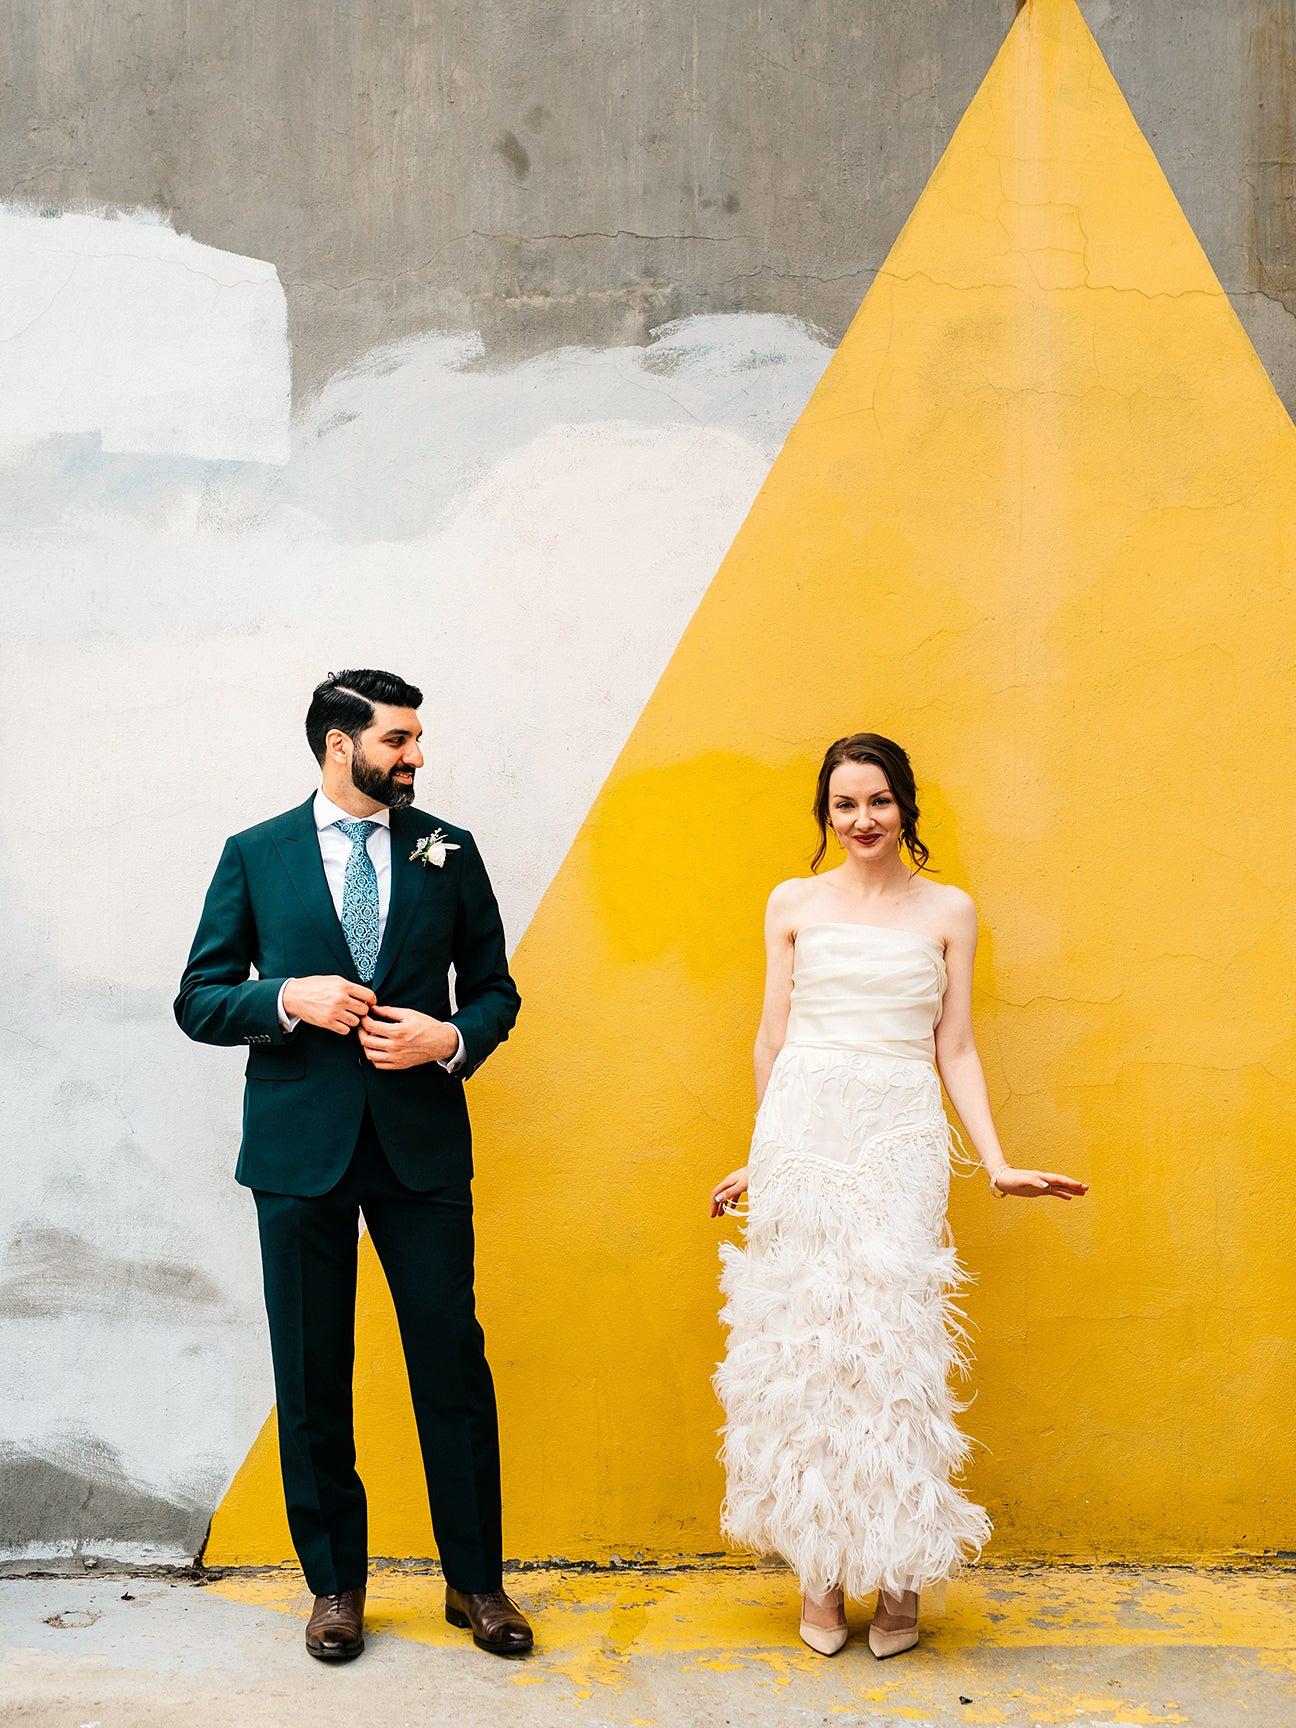 00-FEATURE-Colorful-Toronto-Wedding-domino